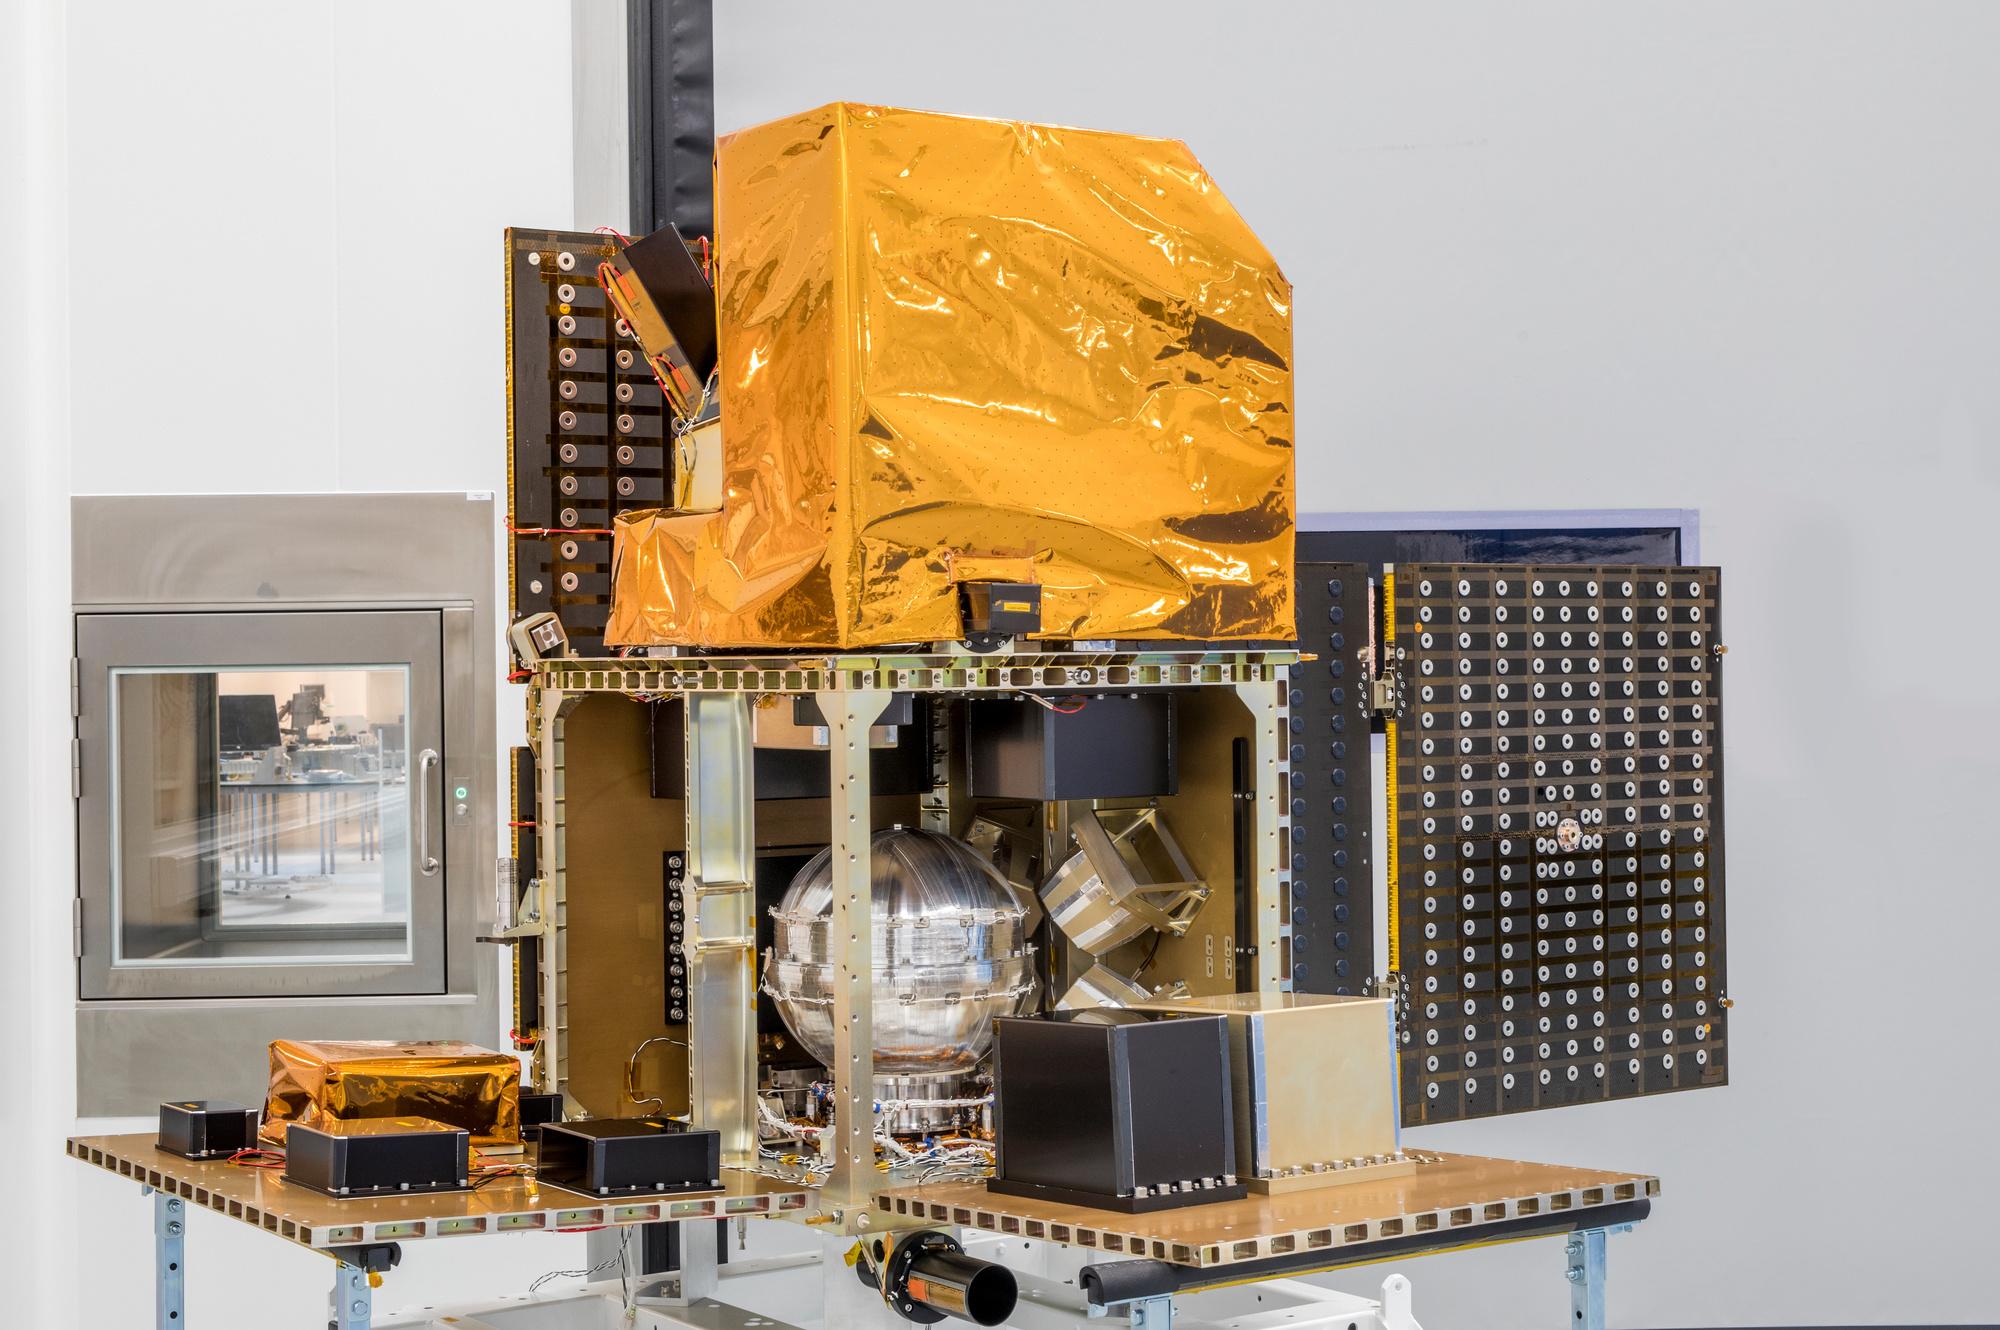 Zo ziet de satelliet die QinetiQ bouwt er uit., QinetiQ